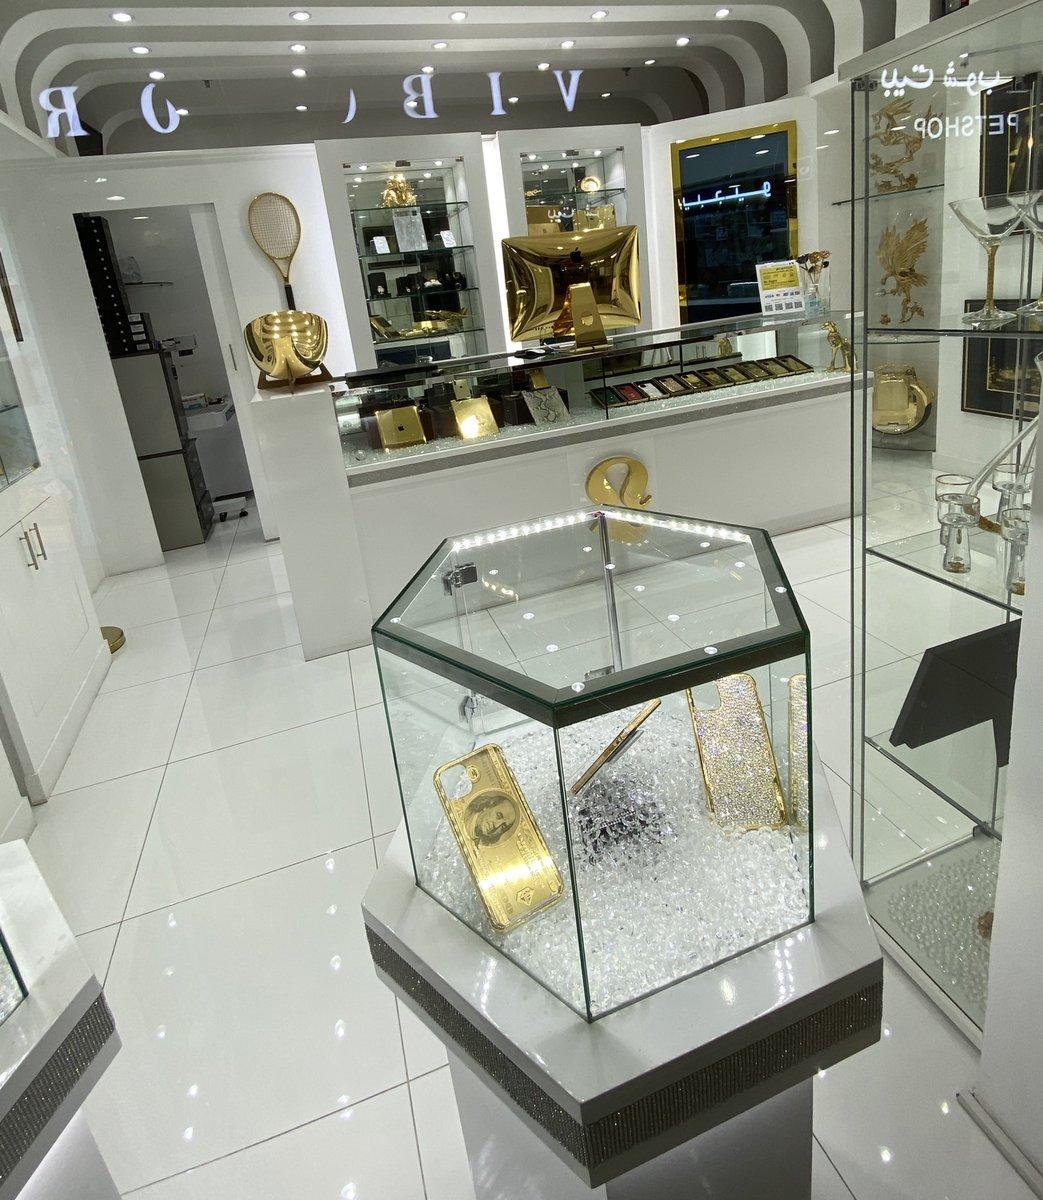 ¡No os perdáis la tienda que nos acabamos de encontrar en Dubái! ¿Alguna vez habíais visto un iMac de oro? 😂 #Apple https://t.co/WwYZCr6Bzy